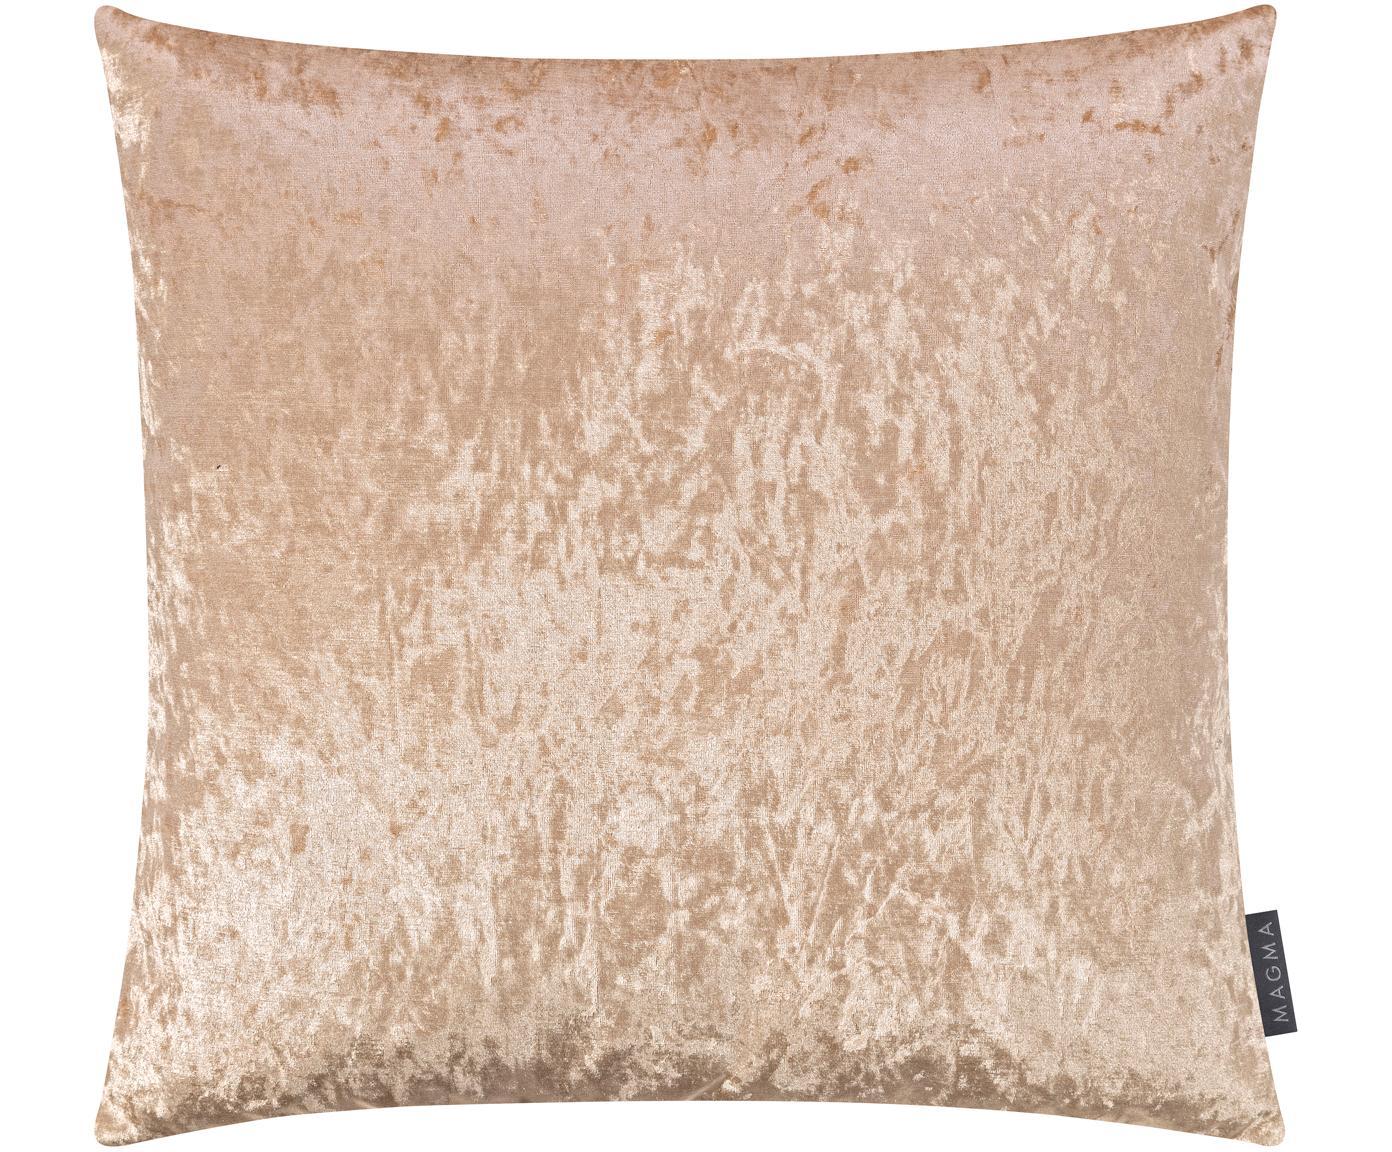 Funda de cojín de terciopelo Shanta, estilo vintage, Terciopelo de poliéster, Champán, Cama 180/200 cm (270 x 280 cm)